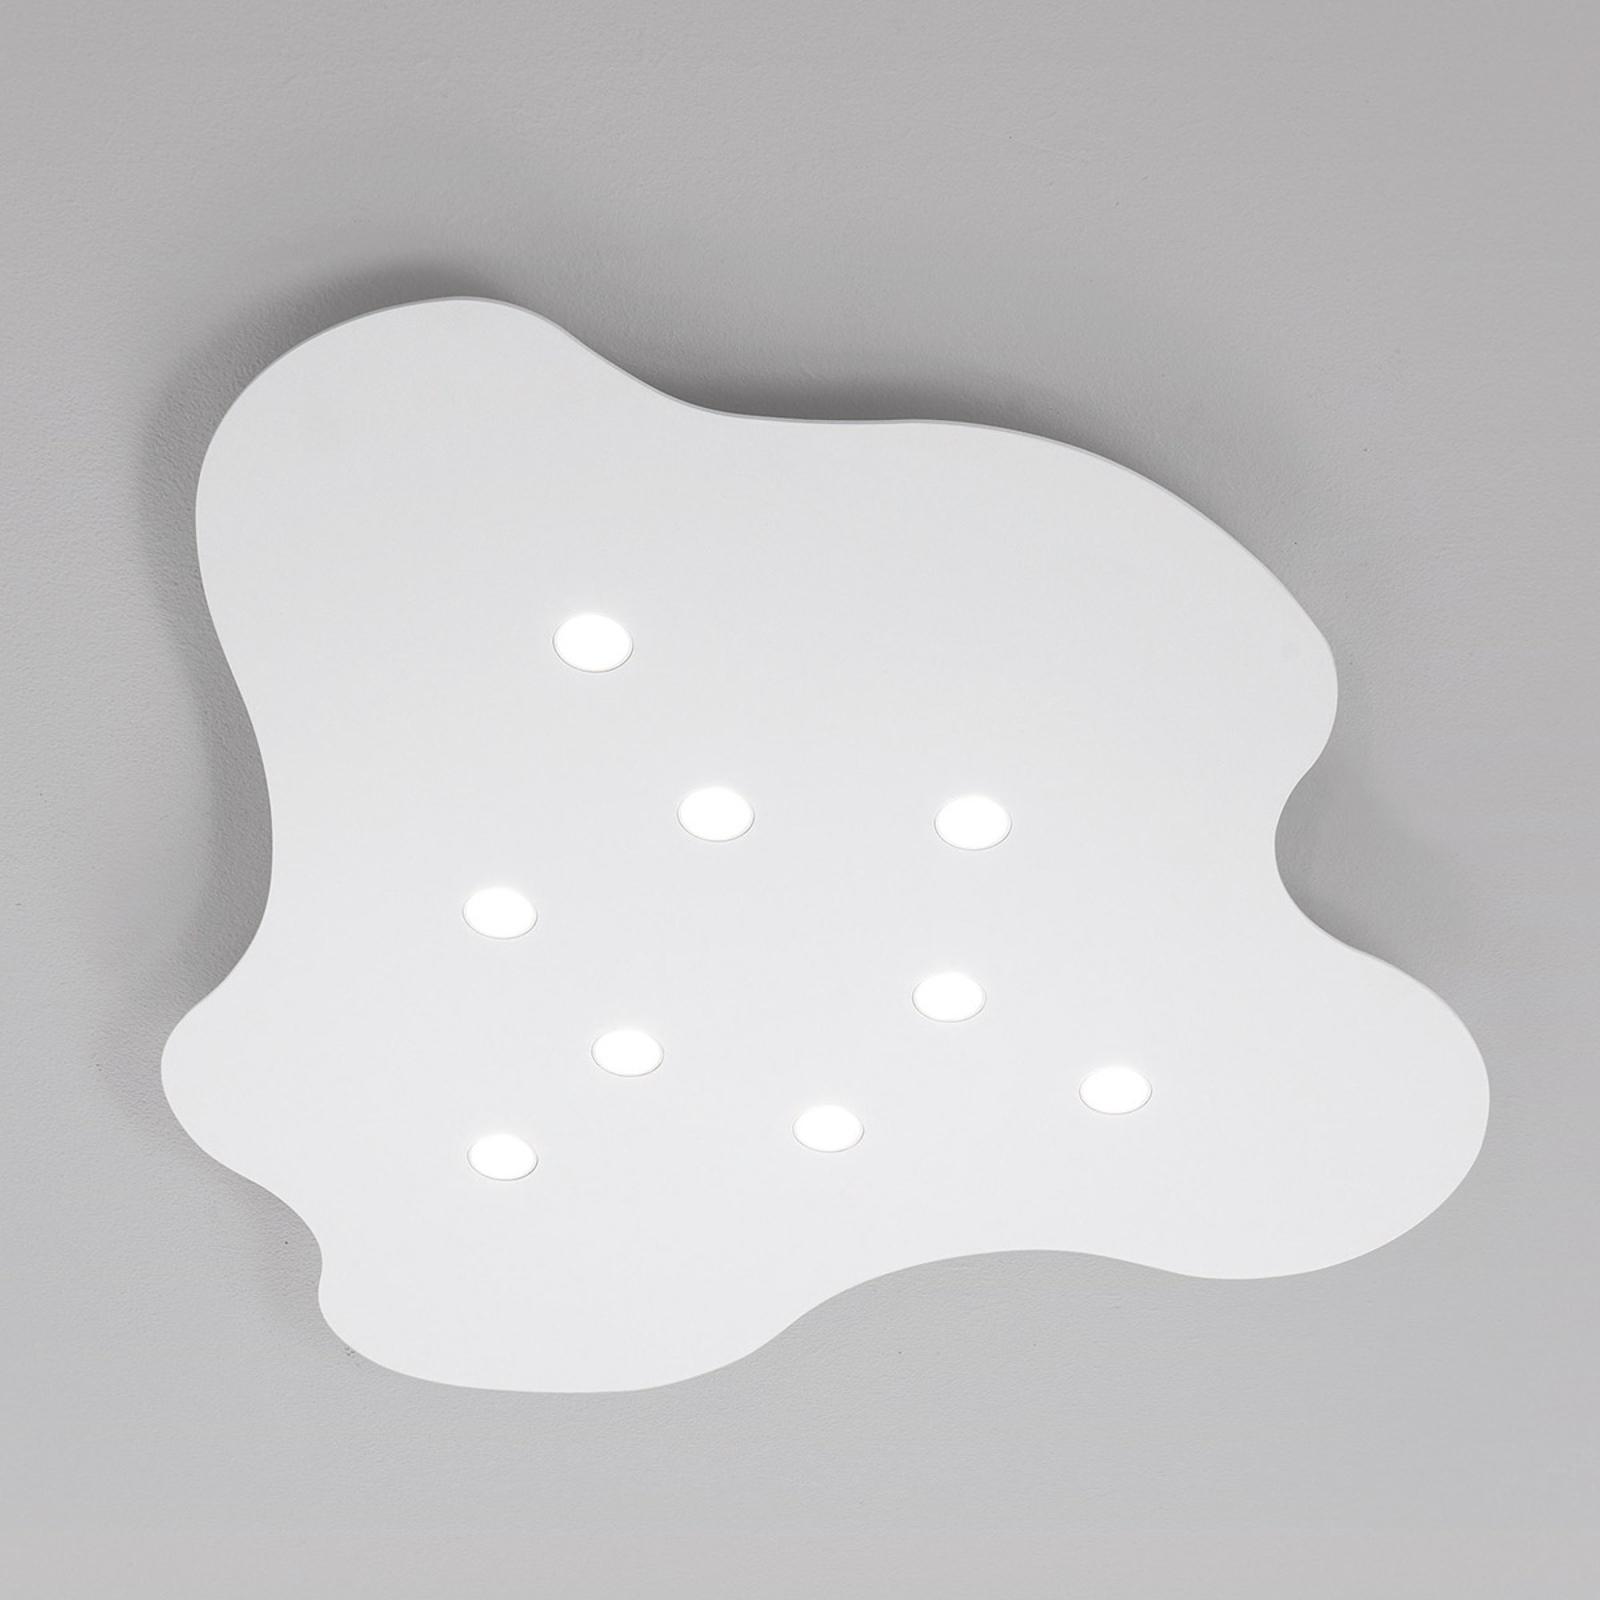 9-lichts LED-plafondlamp Nubes, wit